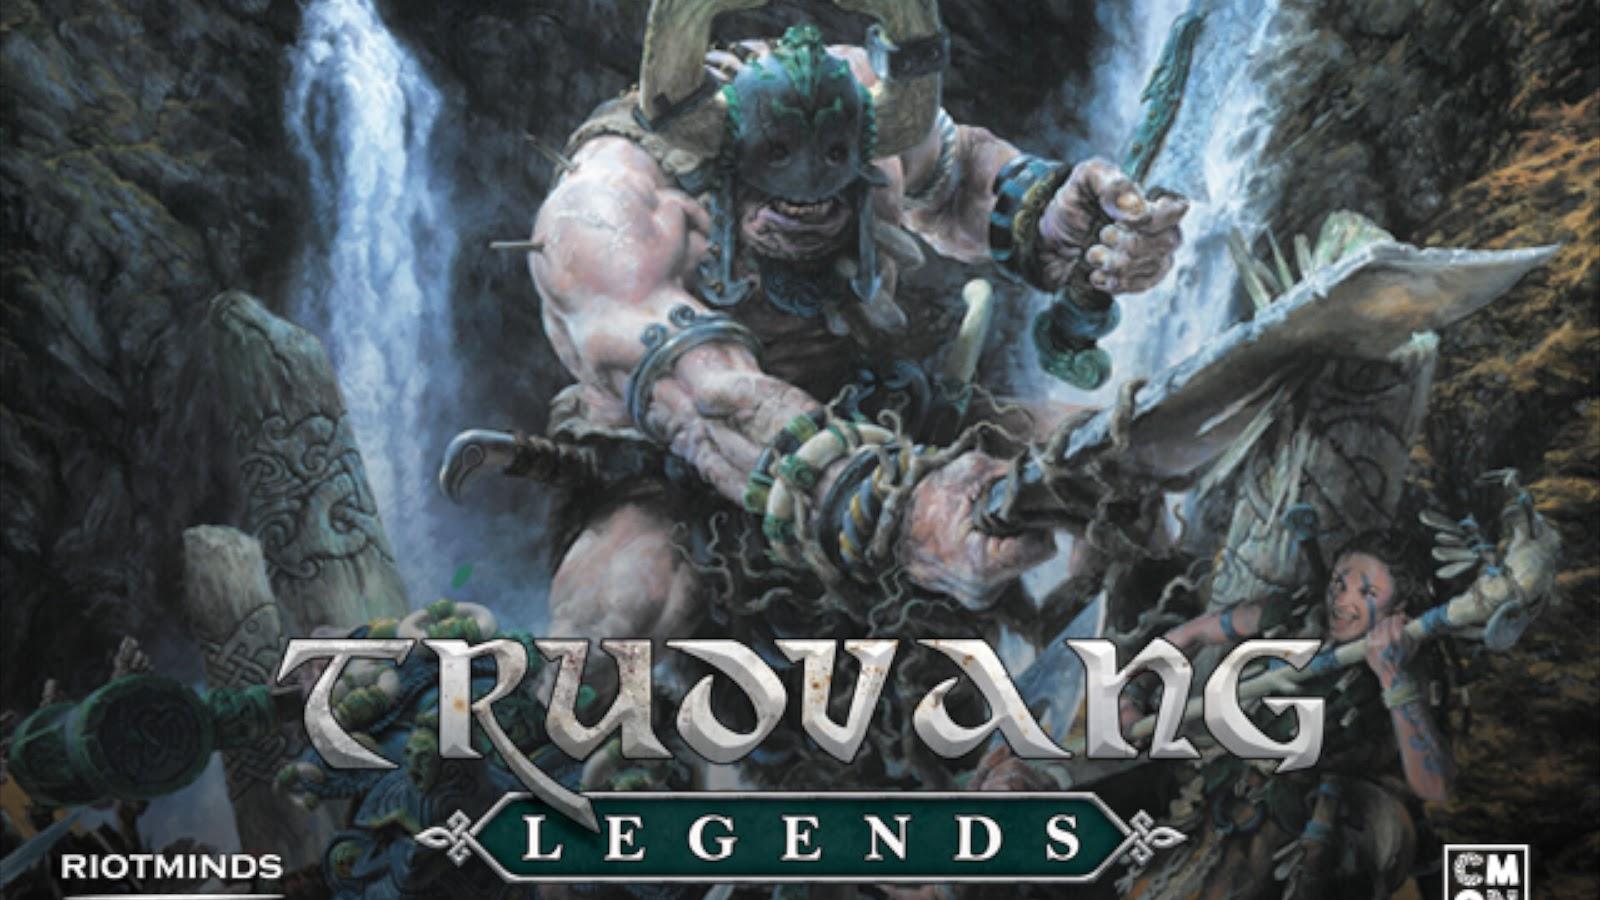 2020 Most Anticipated Games Best Arriving from Kickstarter Trudvang Legends